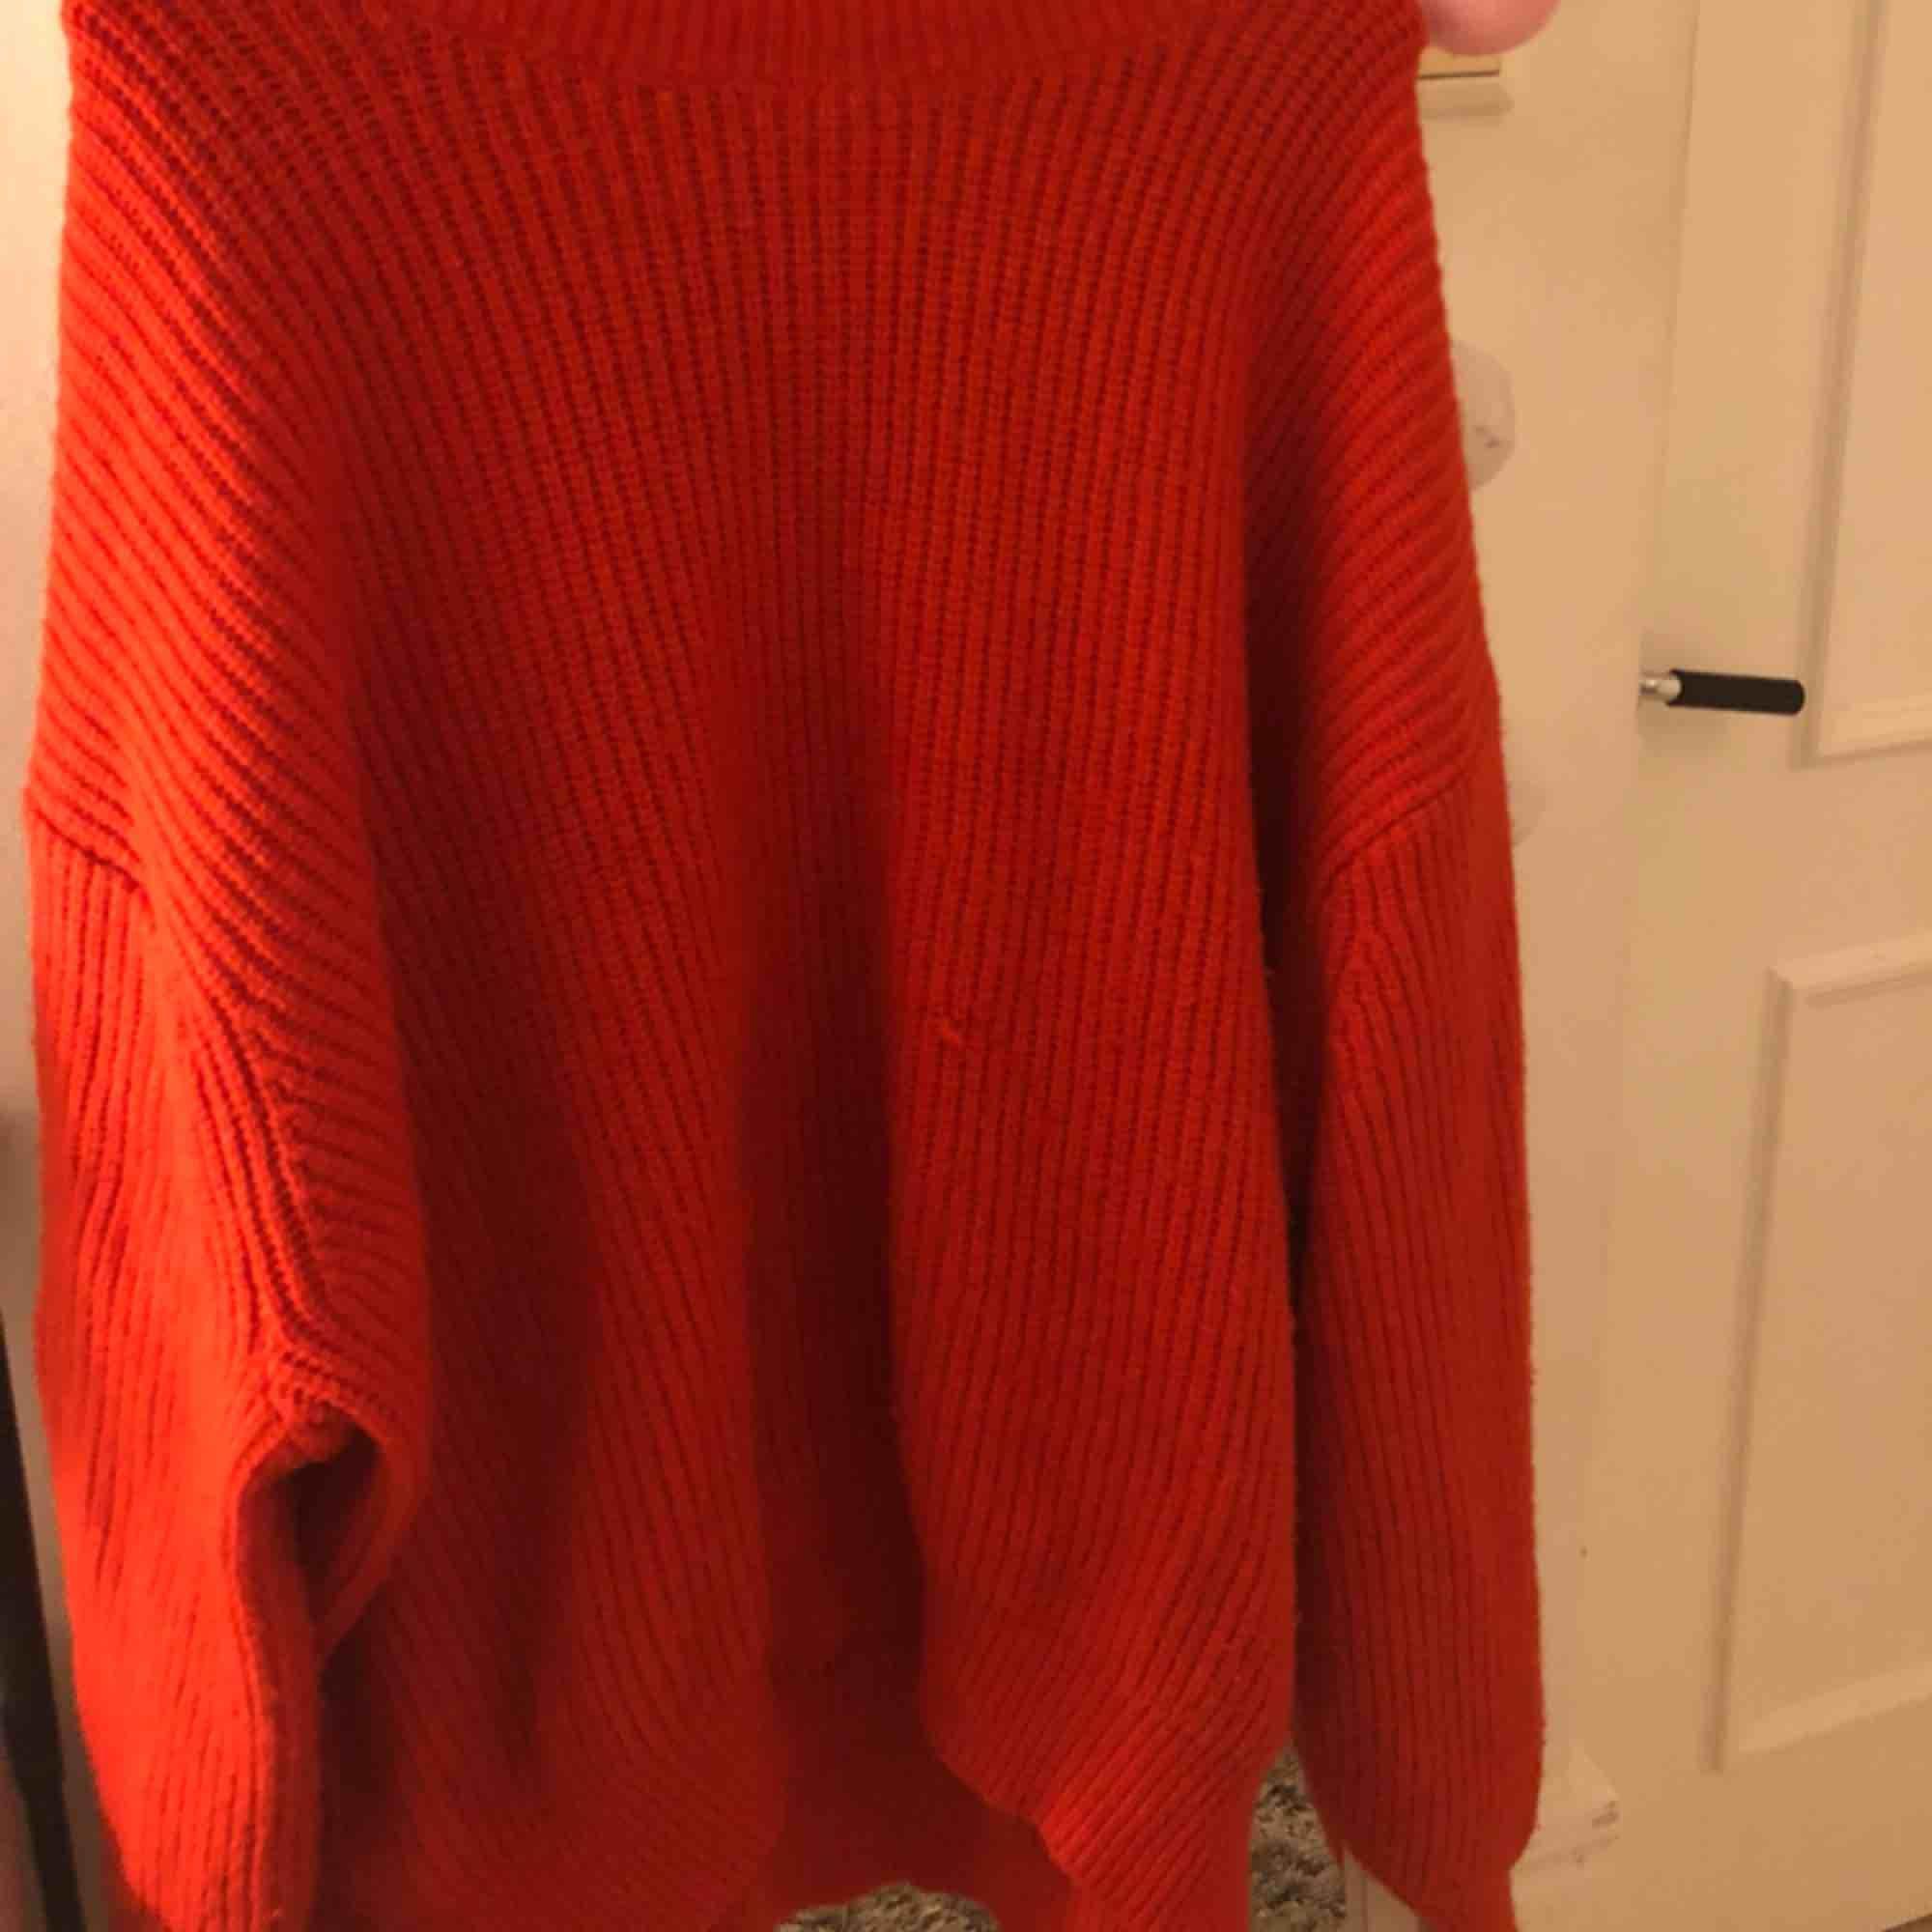 Jätte fin röd stickad tröja. 40 kr + frakt. Stickat.